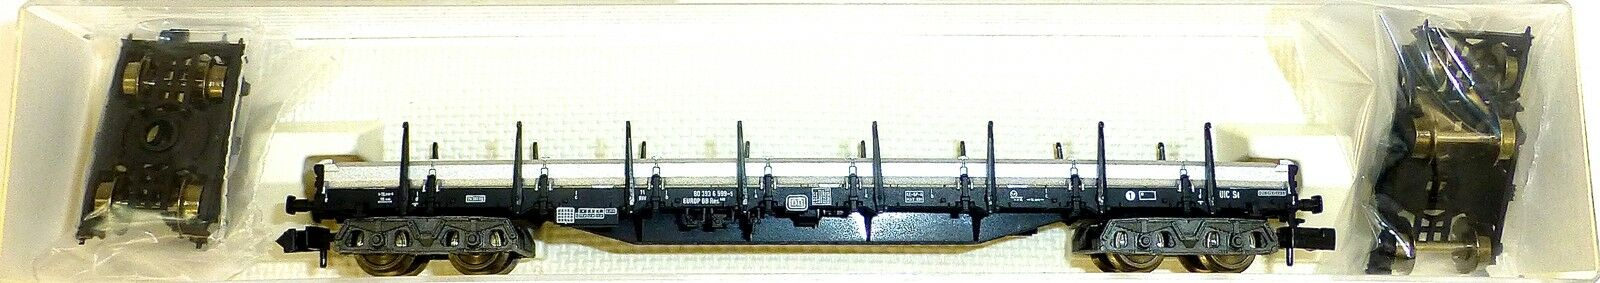 SBB CARRO PIATTO res carrello carico EPV Fleischmann 828702 N 1:160 OVP hq2 µ *